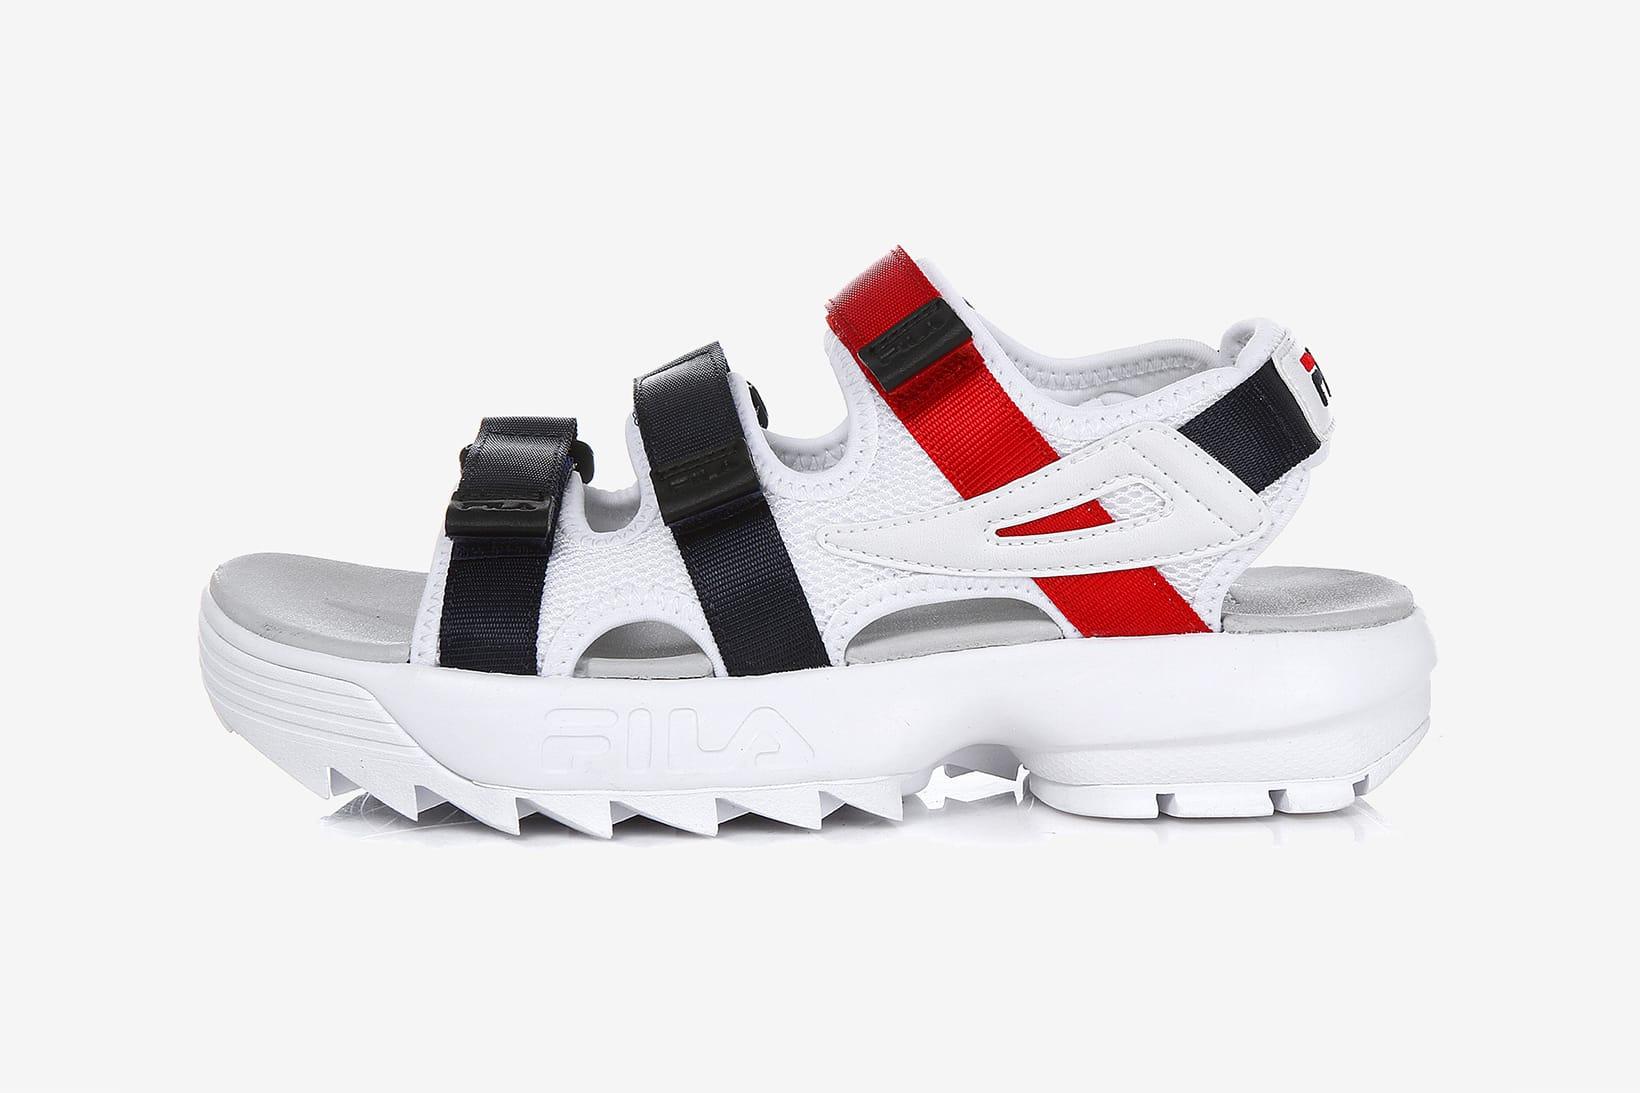 fila sandals 2018